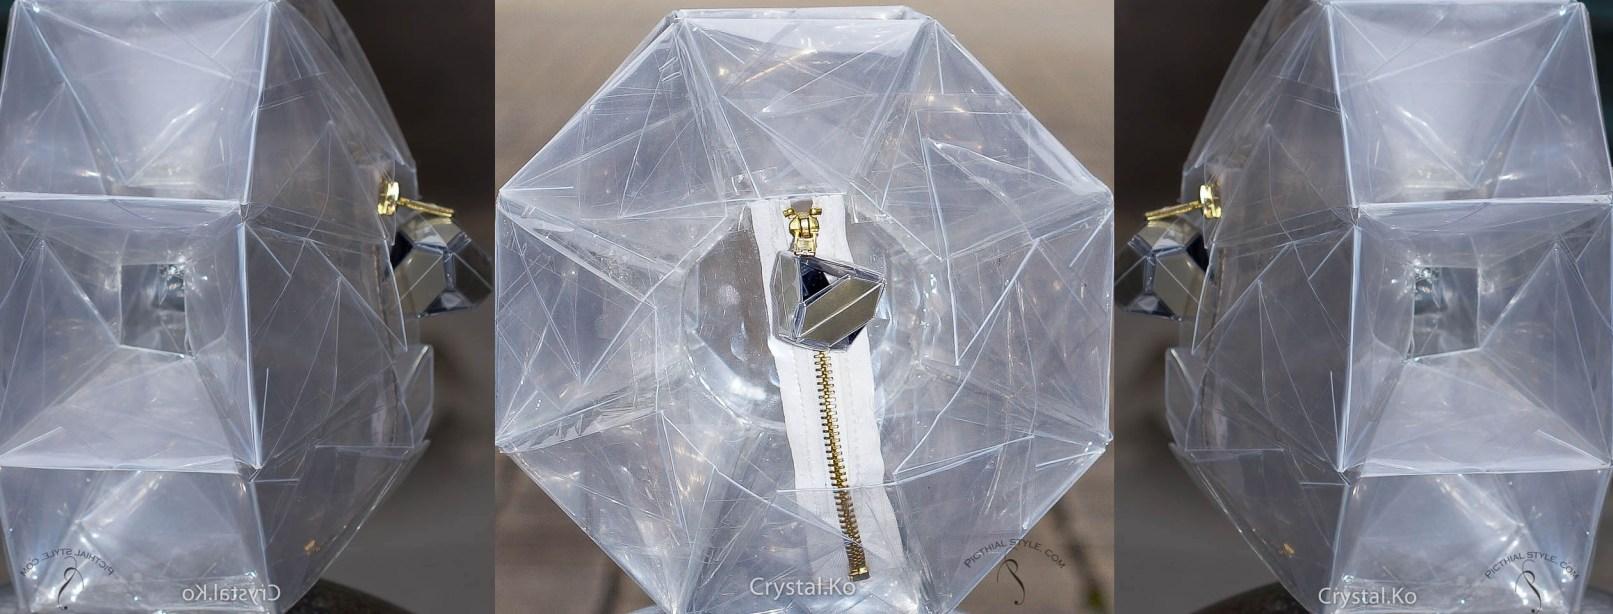 Cristal ko Clutch Bag